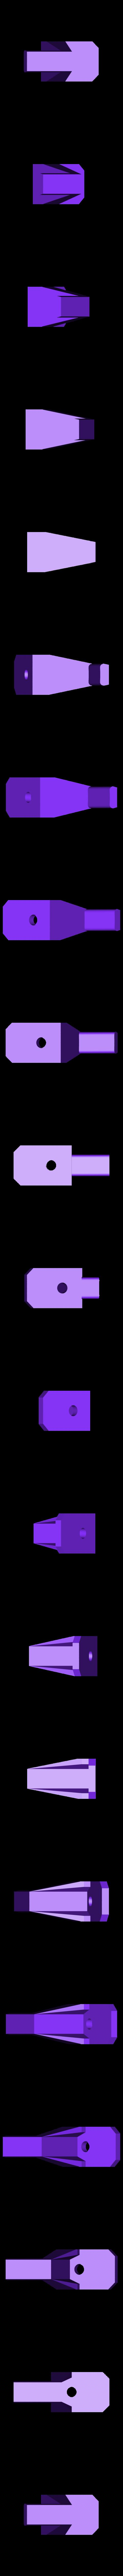 Limit_Beam.STL Download STL file 3D_Print_Follow_Focus_V2.0 • 3D printable template, SWANGLEI